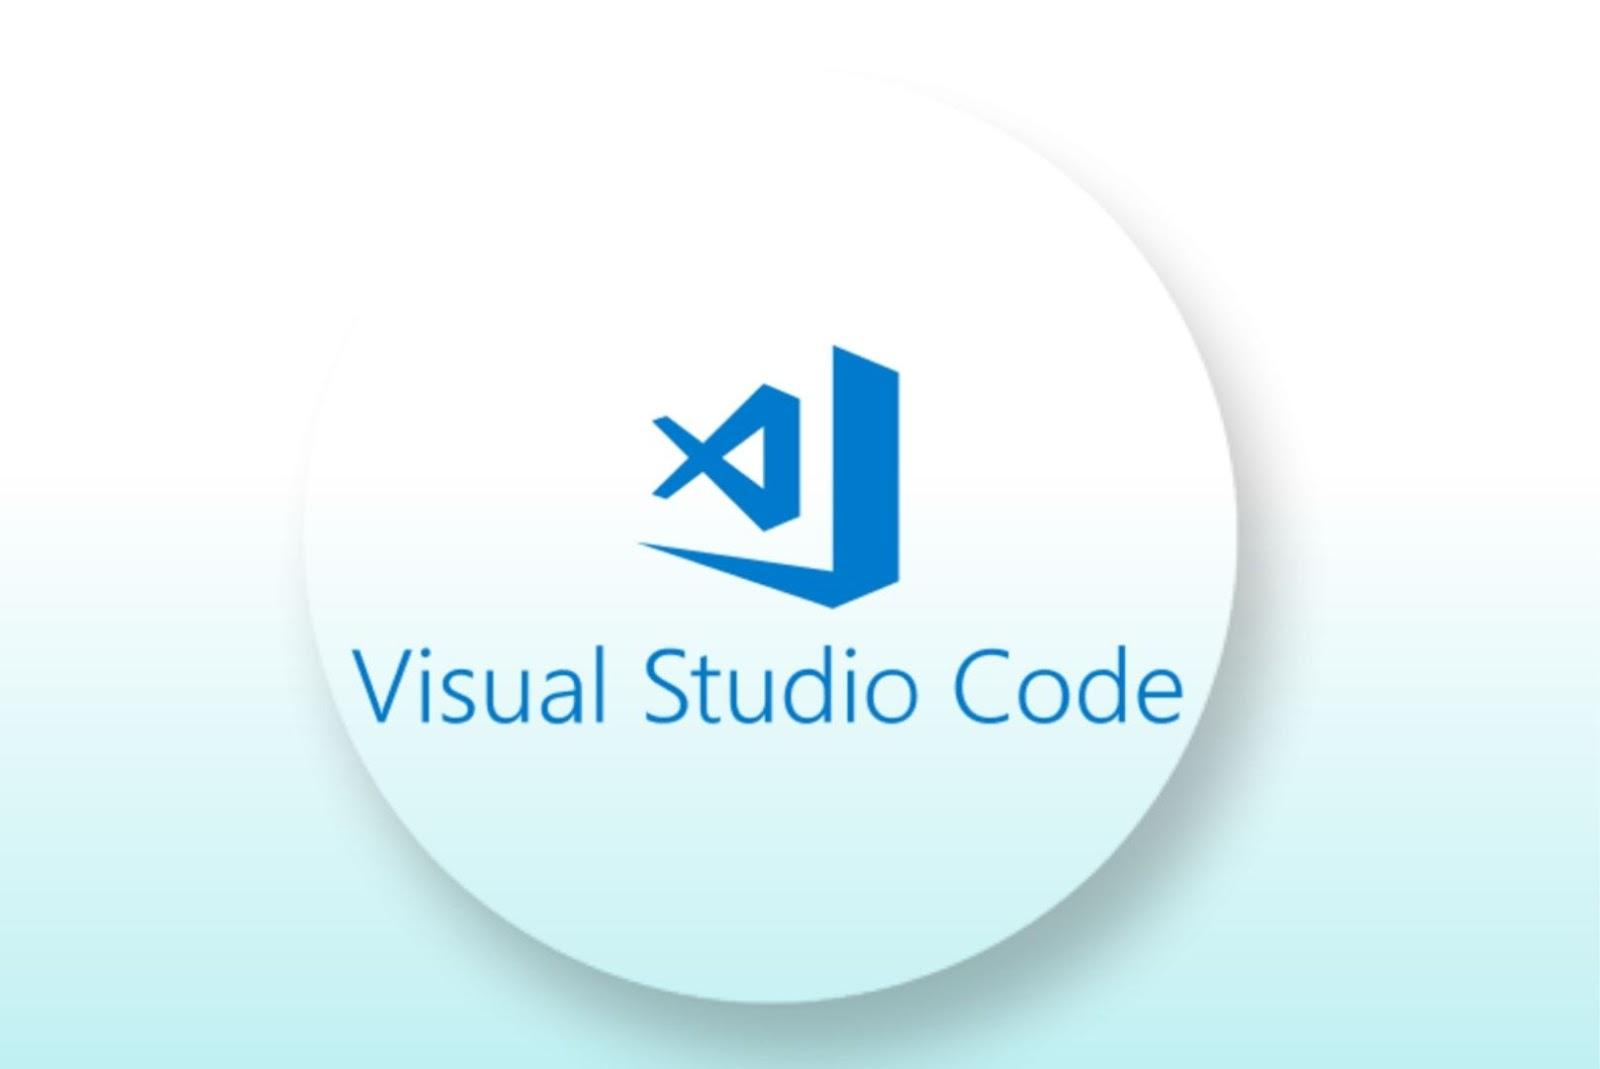 Visual Studio Code flutter app development tools